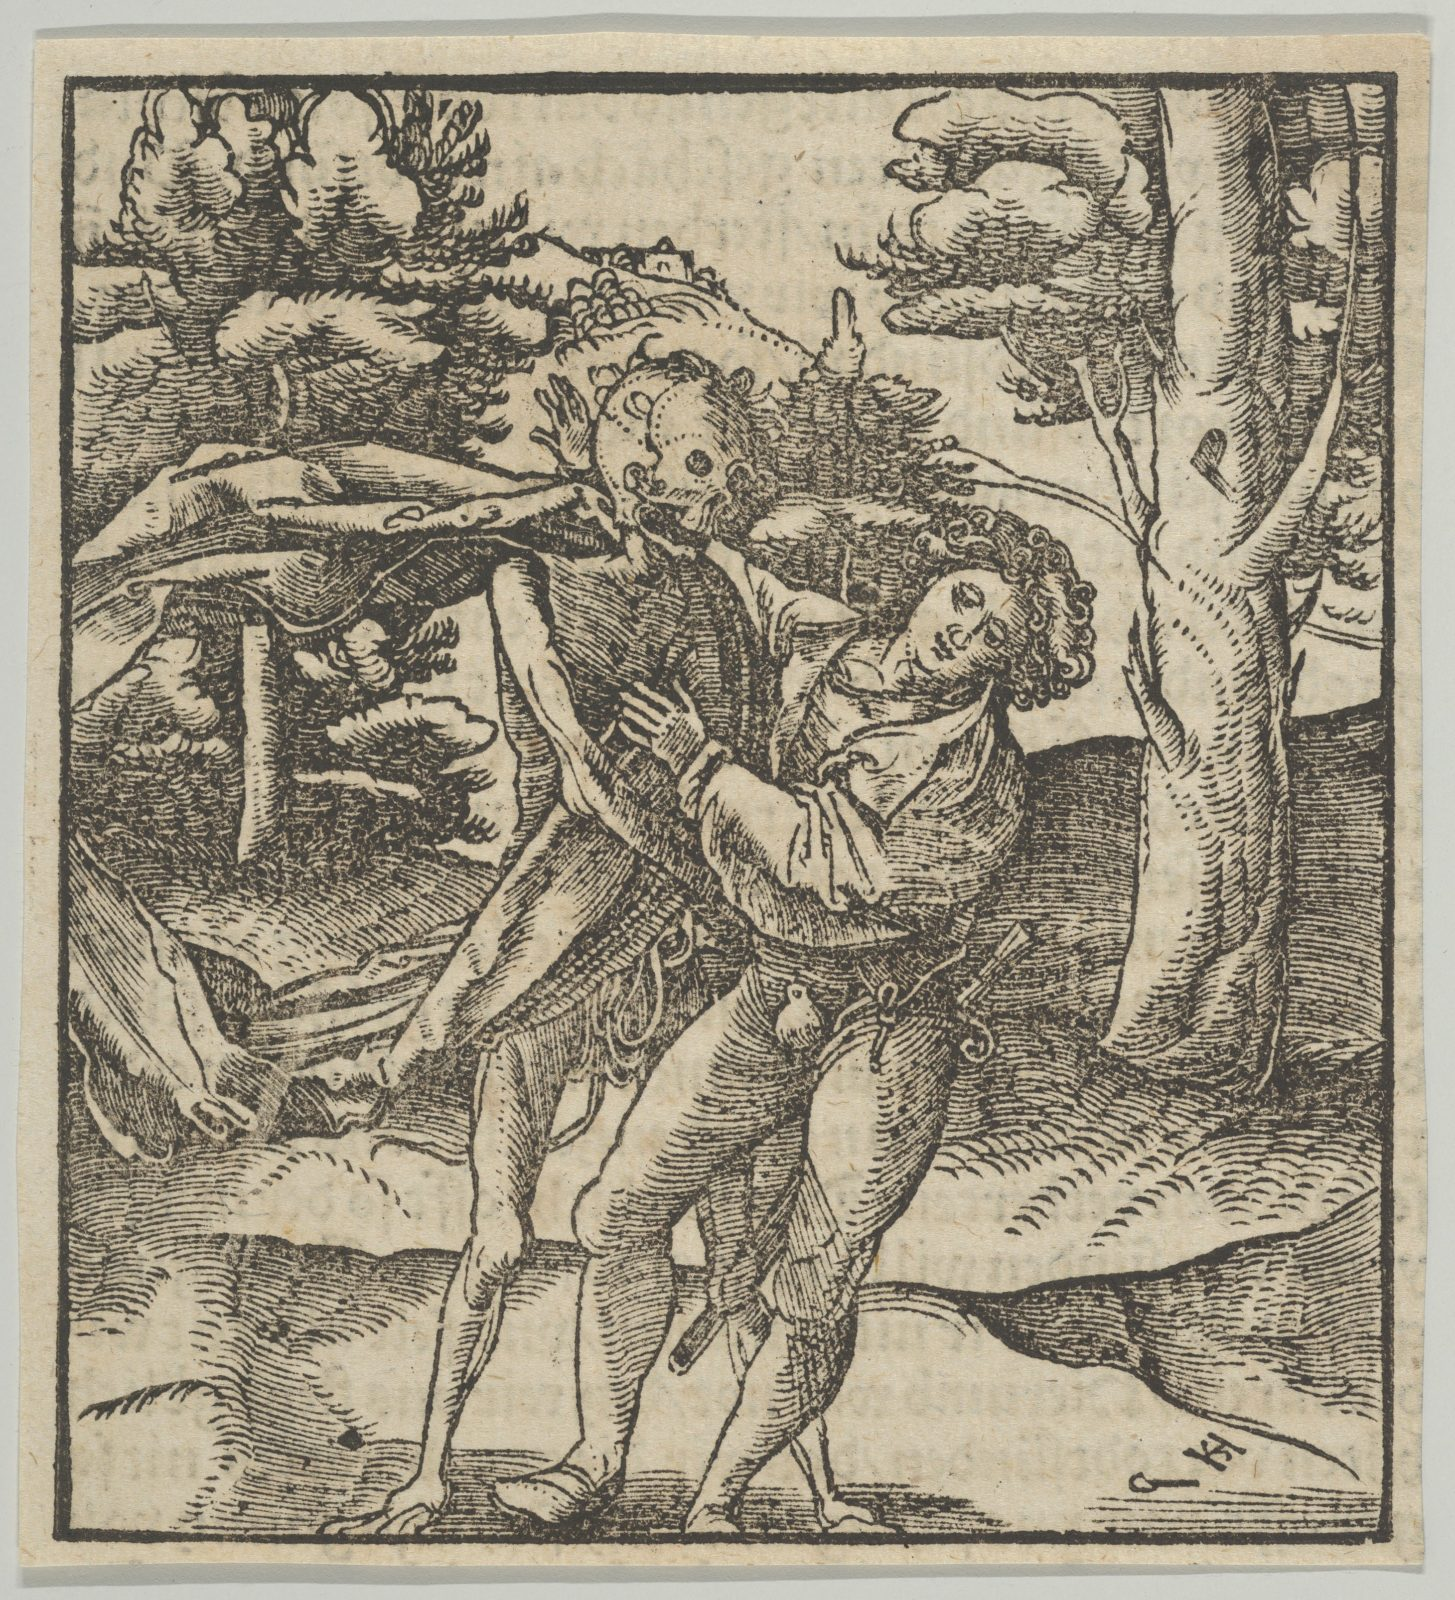 A Young Man Seized by Death, from Hymmelwagen auff dem, wer wol lebt...